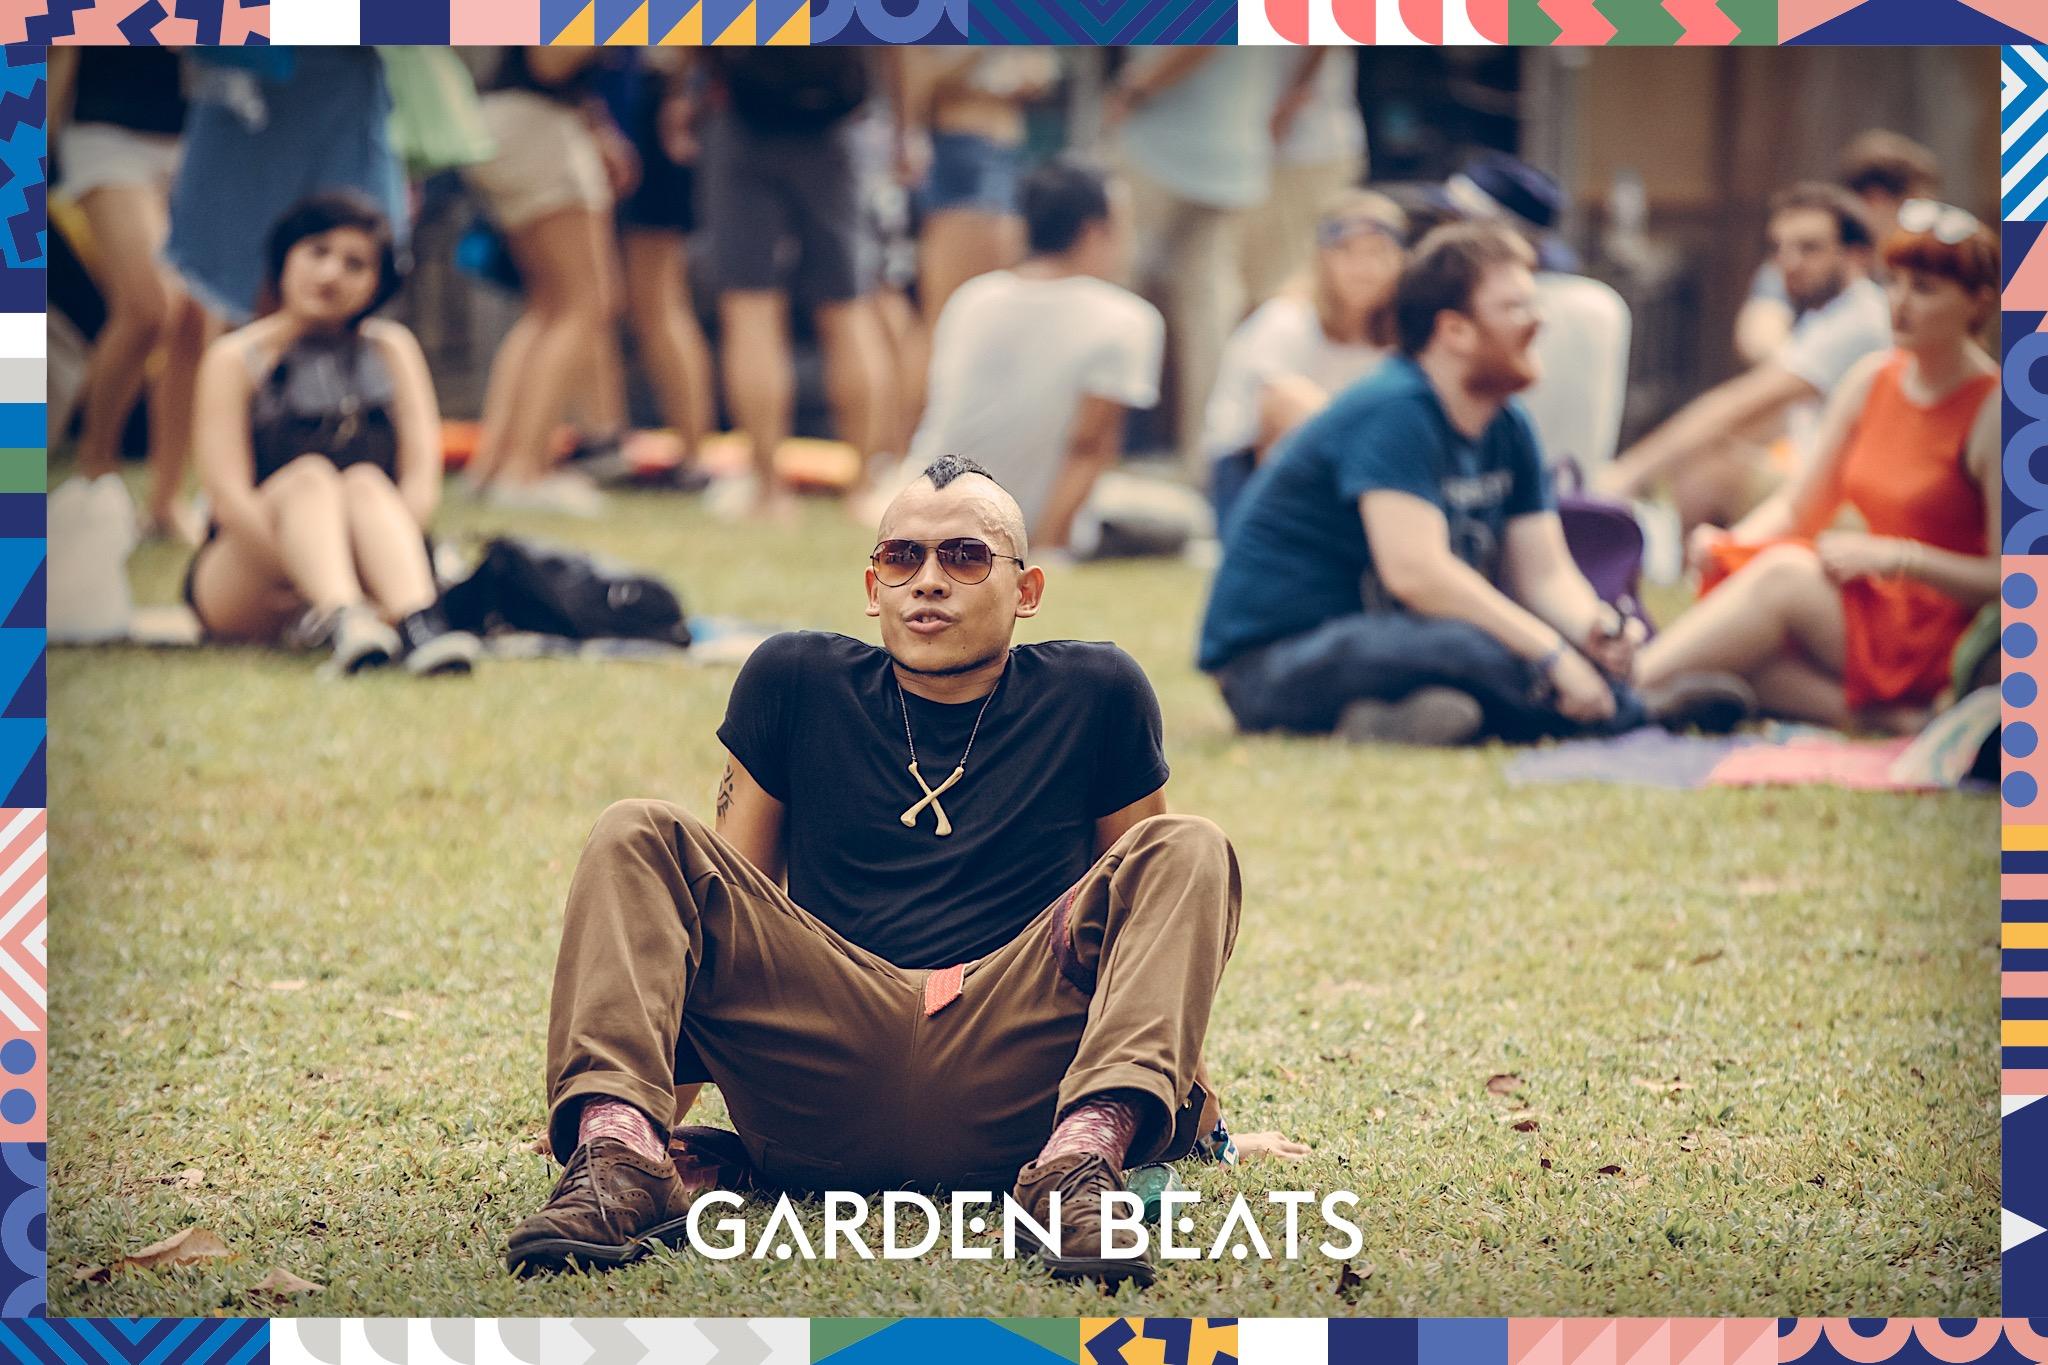 03032018_GardenBeats_Colossal395_Watermarked.jpg